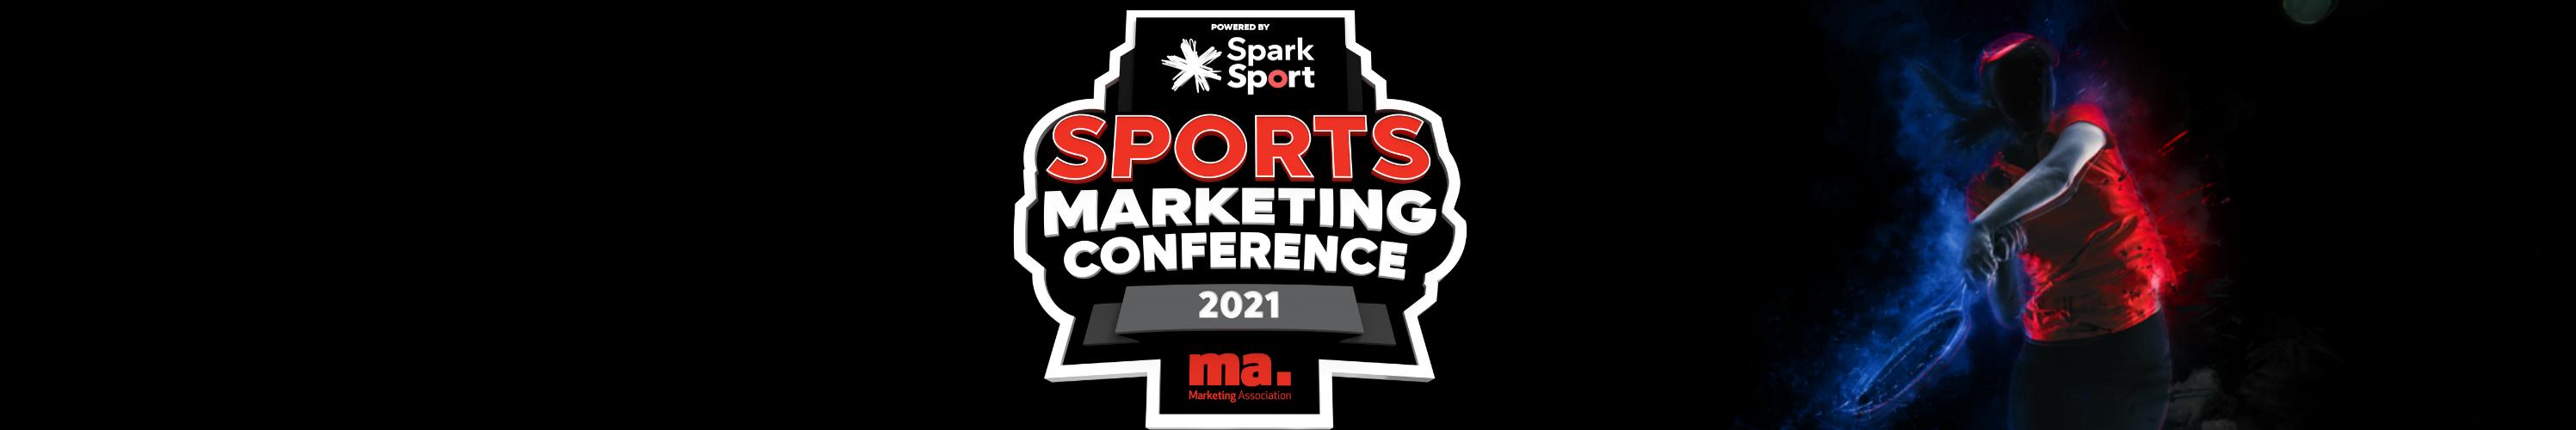 SportsM Web Banner (1)